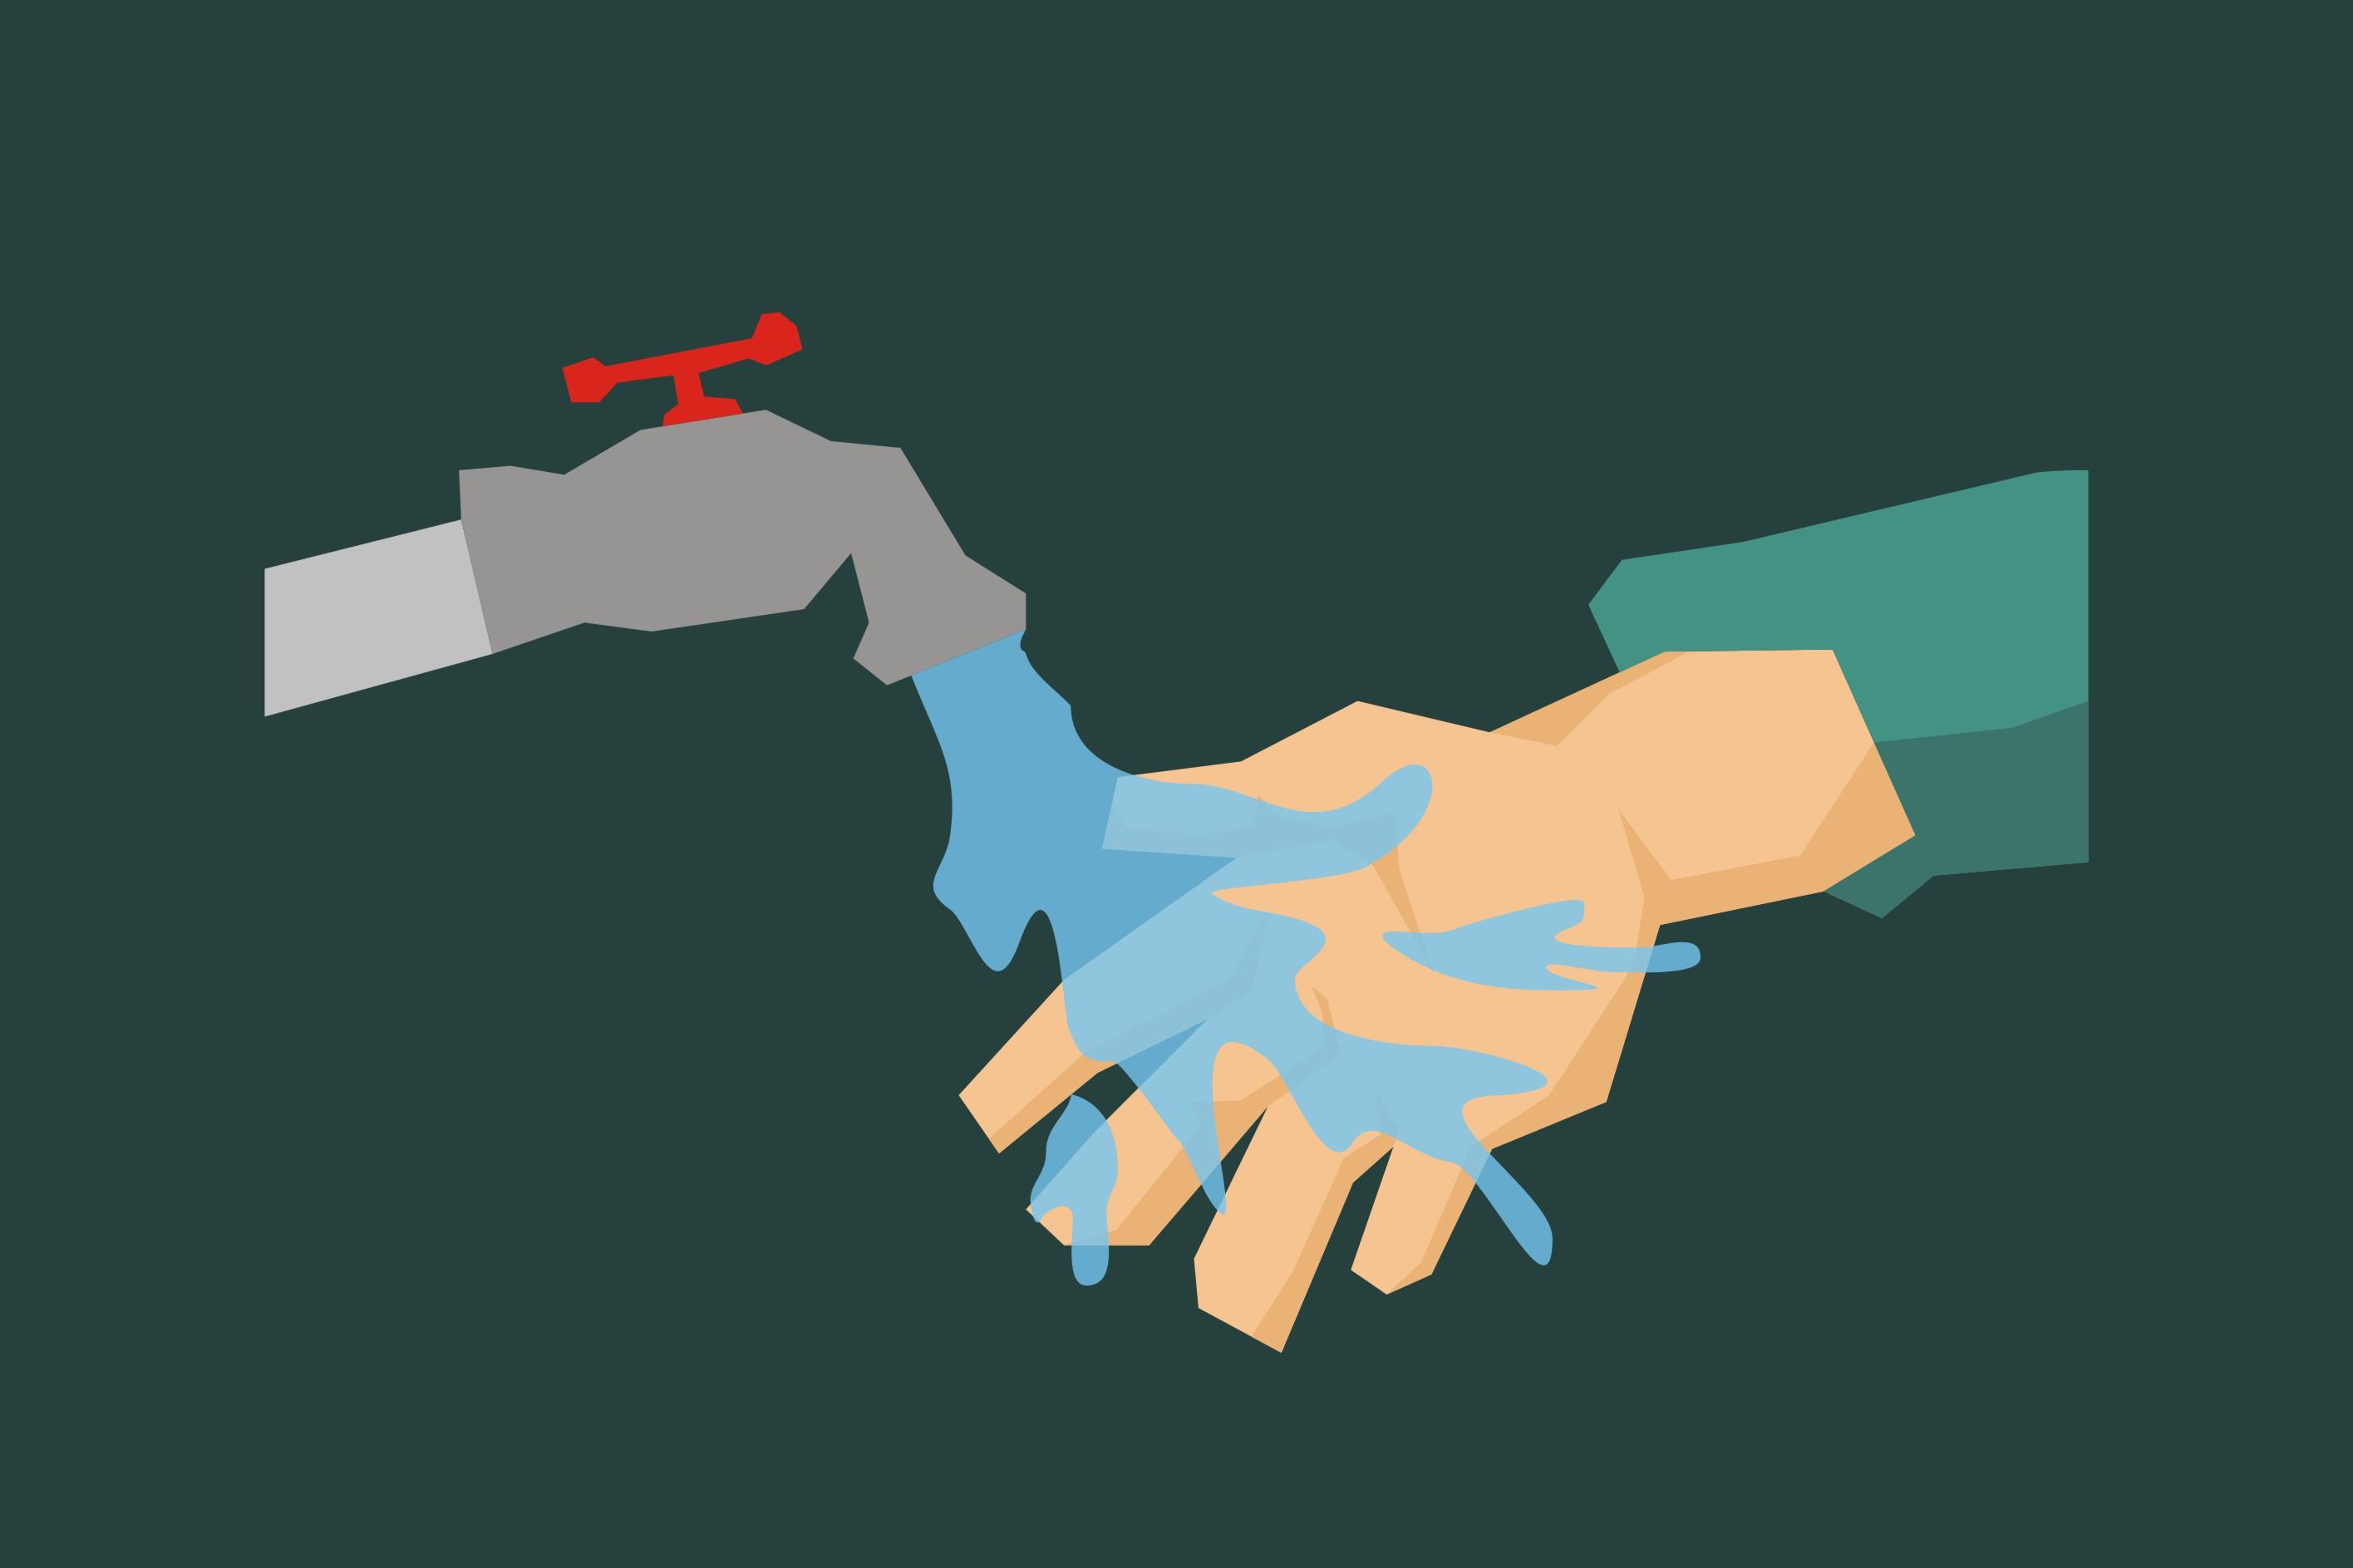 VIDEO: Keringkan tangan pakai handuk lebih bahaya dibanding hand dryer